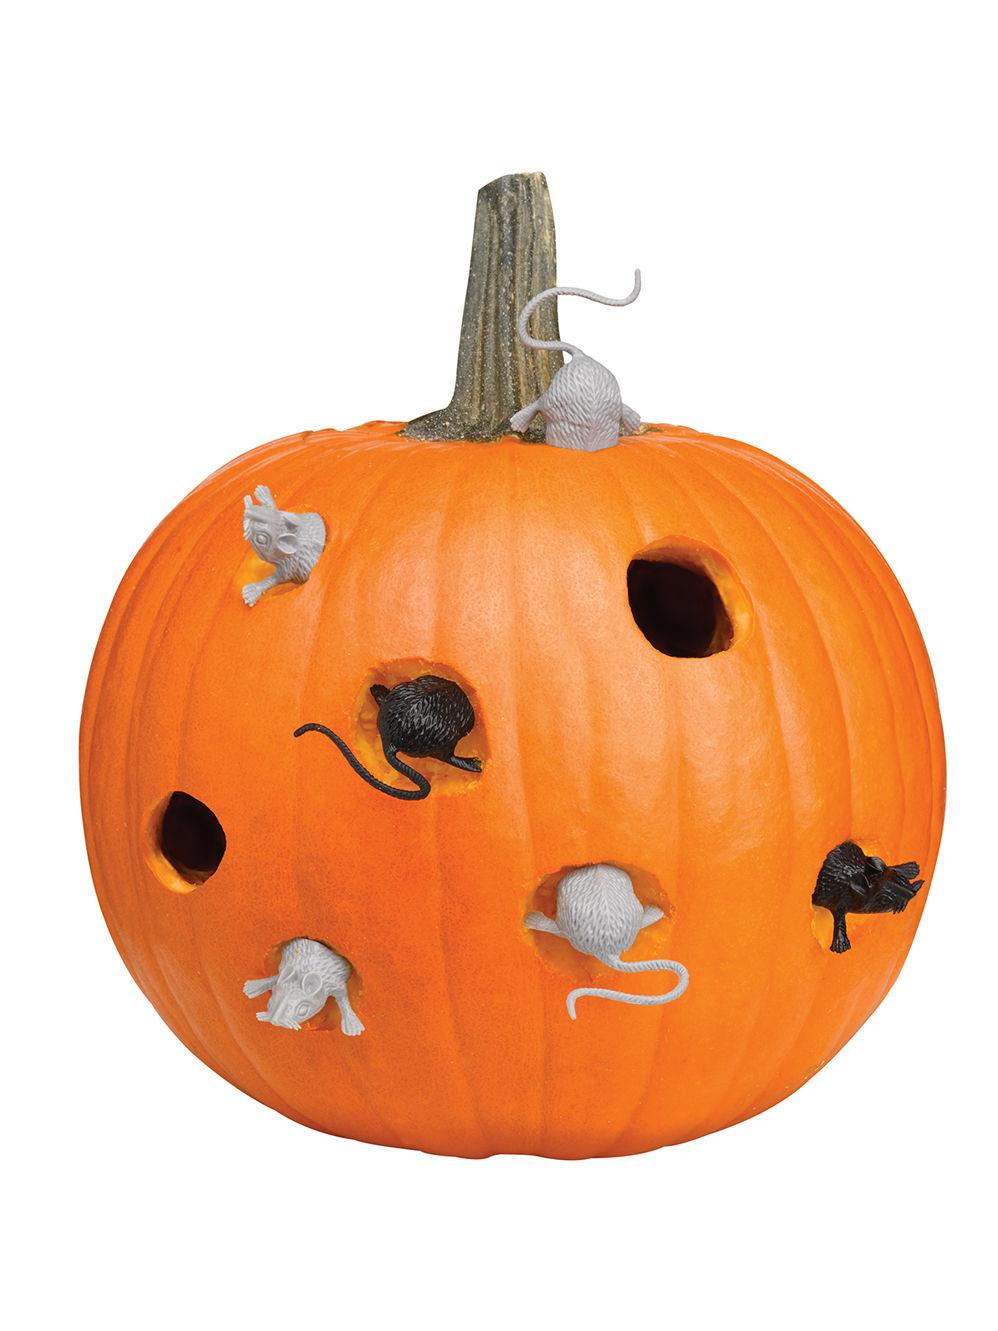 Kuerbis Schnitzen Pirat.Kurbis Set Mause Halloween 8 Teilig Bunt Partydeko Und Gunstige Faschingskostume Vegaoo